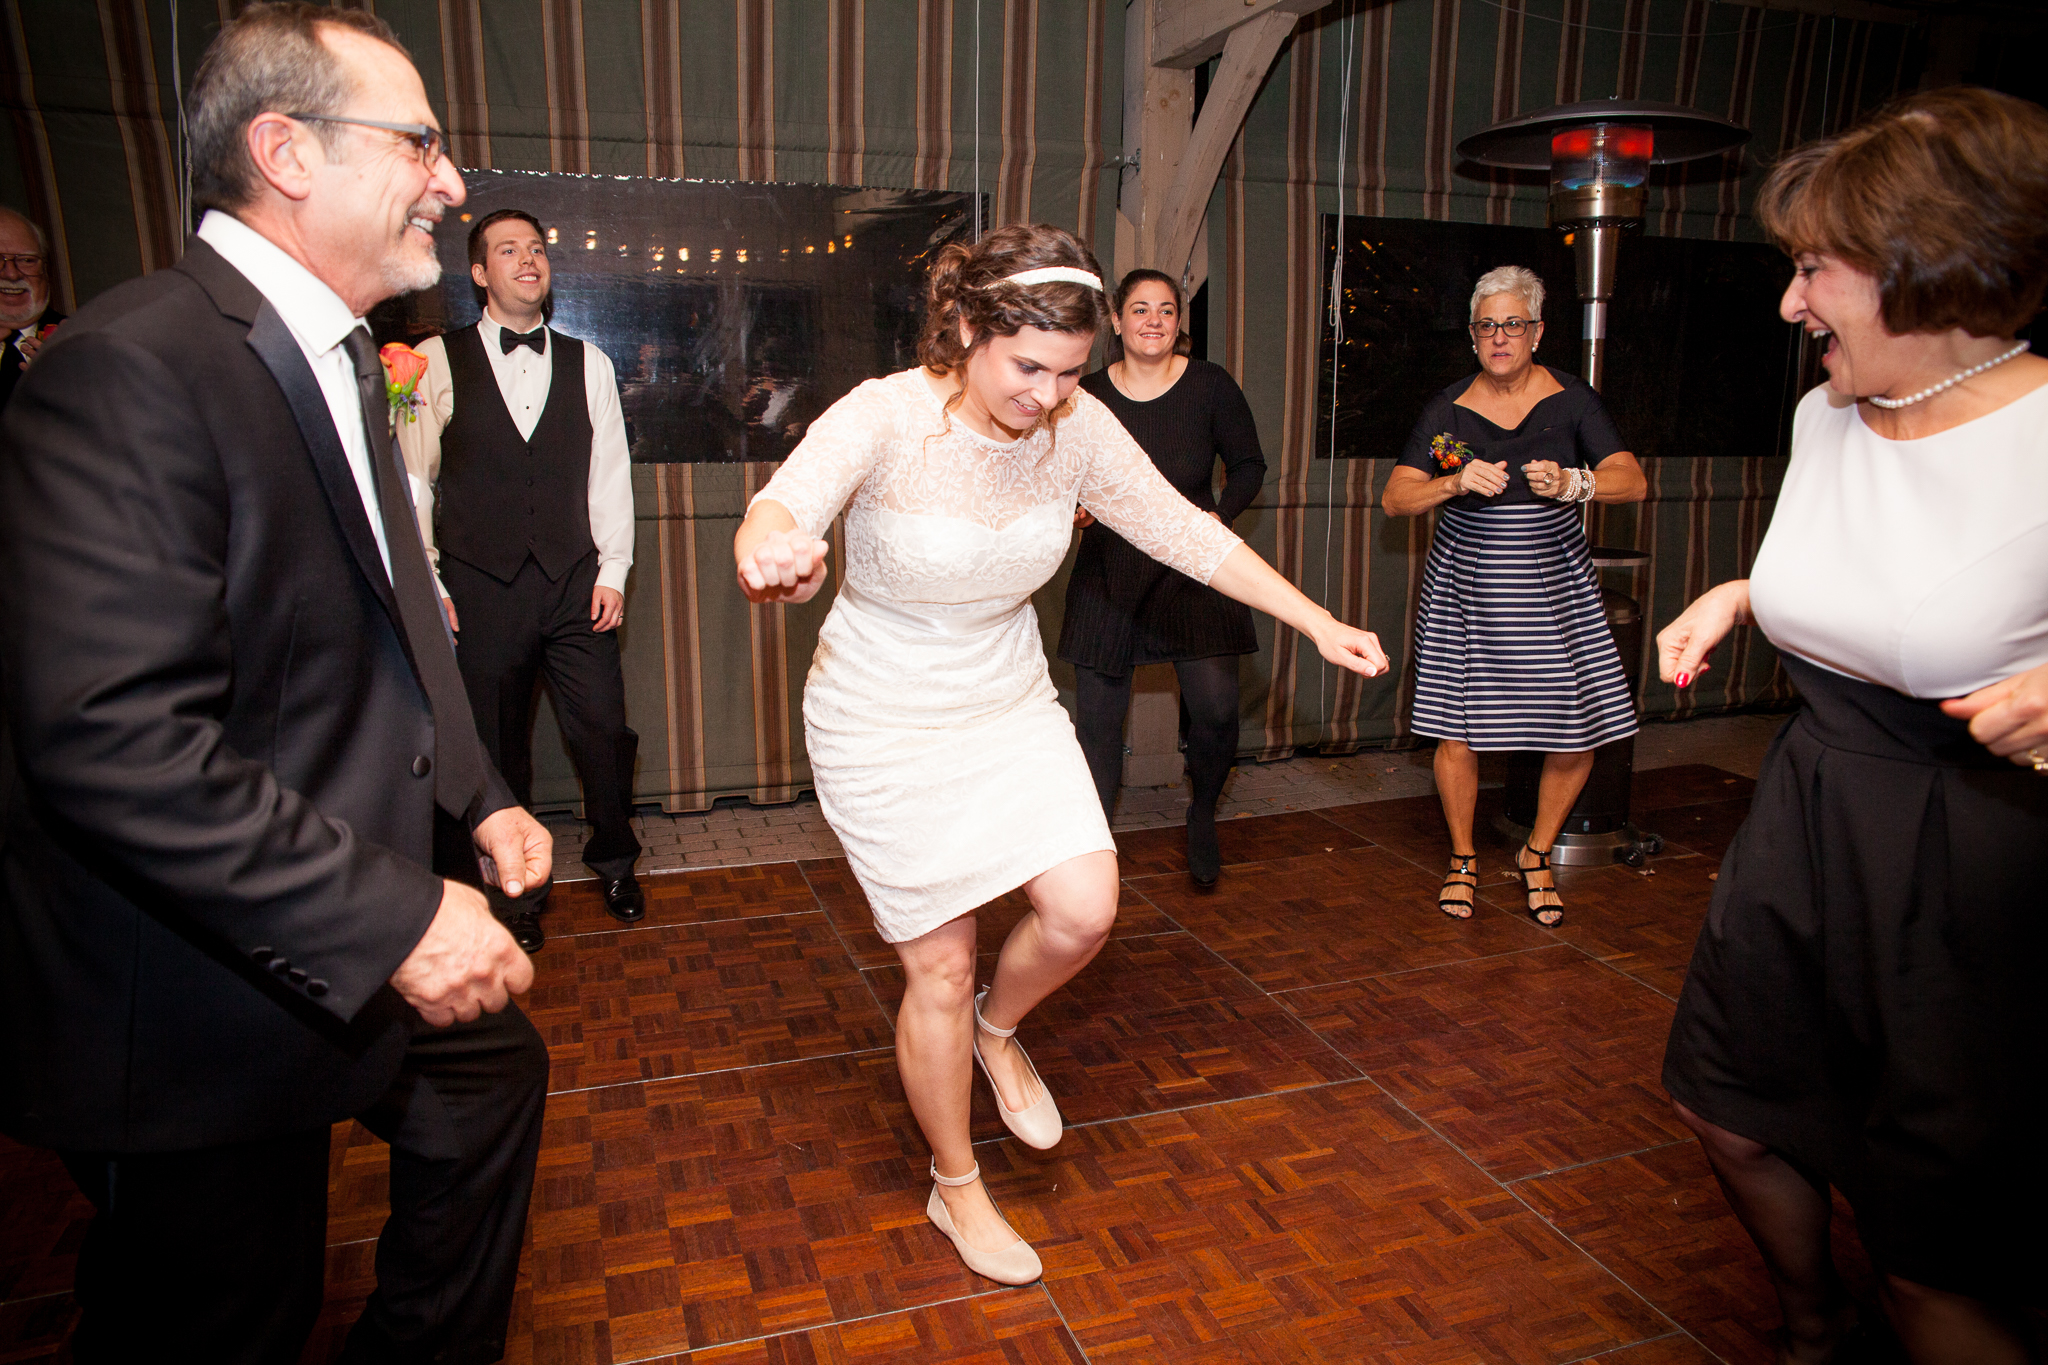 camuglia-whomstudio-chelsea_and_andy-nycphotographer-wedding-brooklyn-buffalo-timberlodge-147-0925.jpg